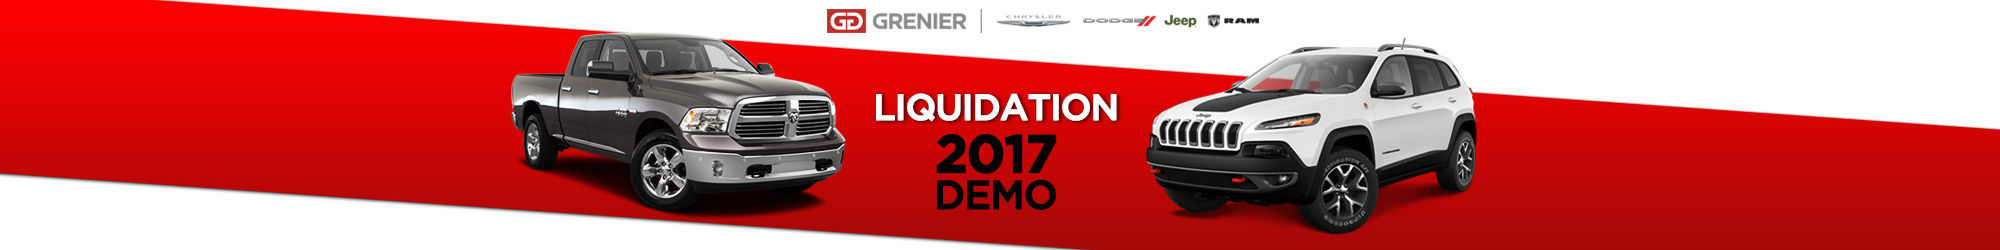 Demo Liquidation